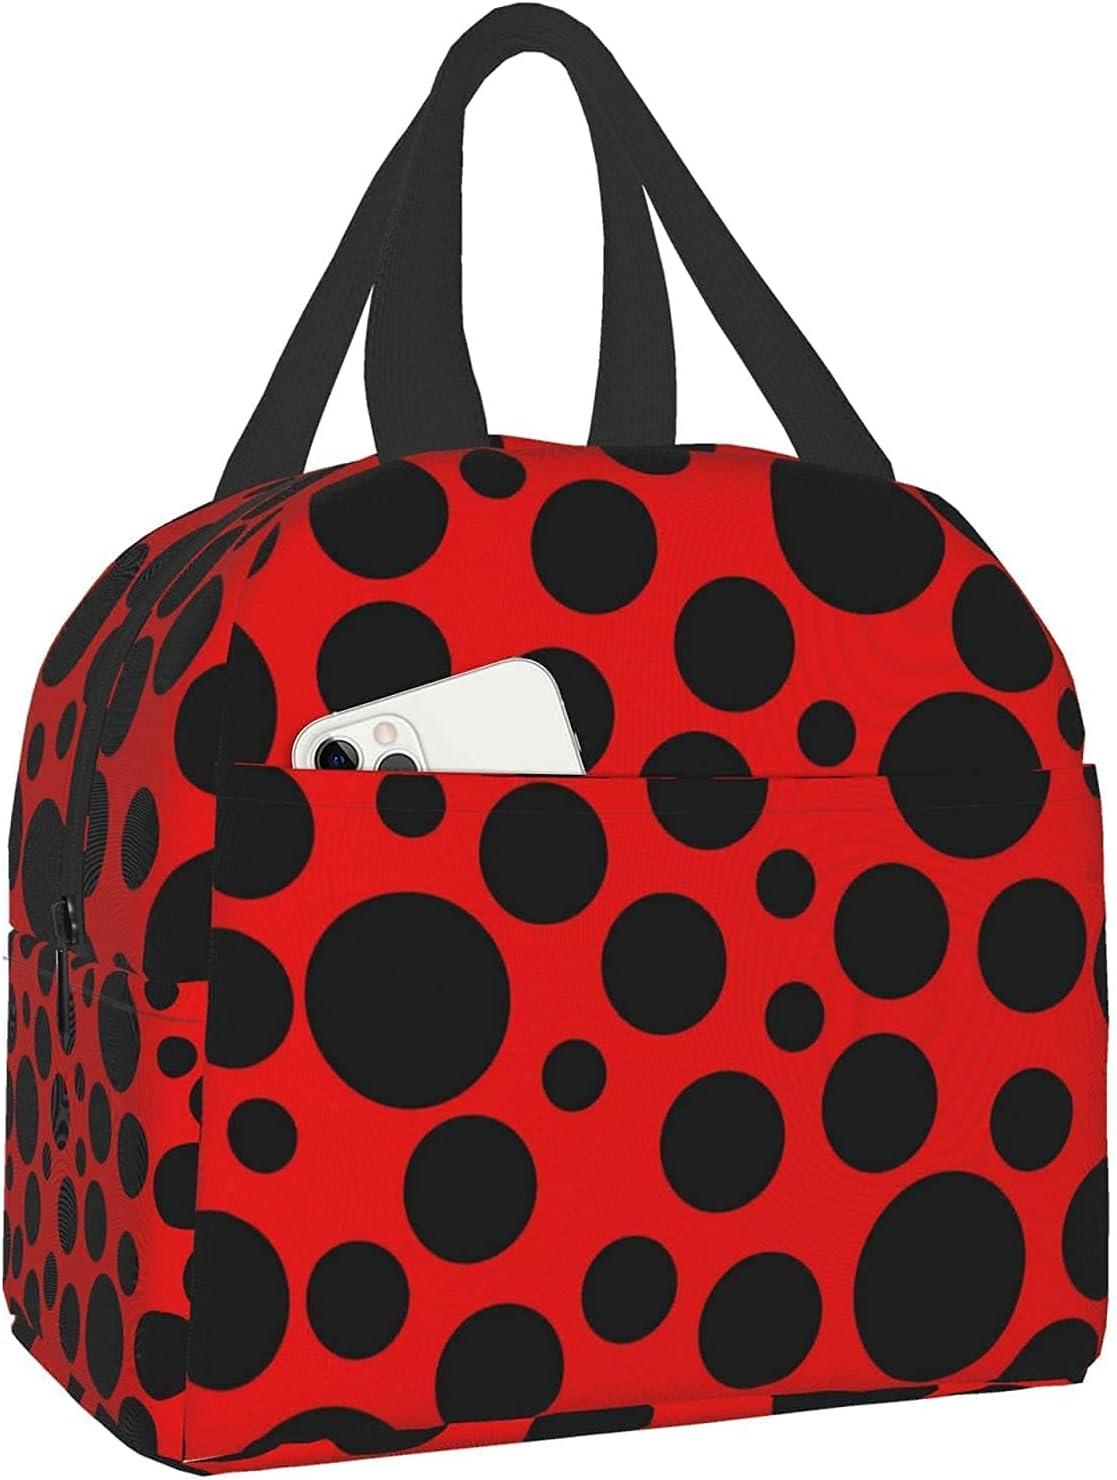 Bolsa de almuerzo Lady Bug Black Dots on Red Tote Bag Fiambreras Loncheras Bolsa térmica con aislamiento reutilizable Bolsa de comida térmica resistente al agua Bolsa de refrigerios